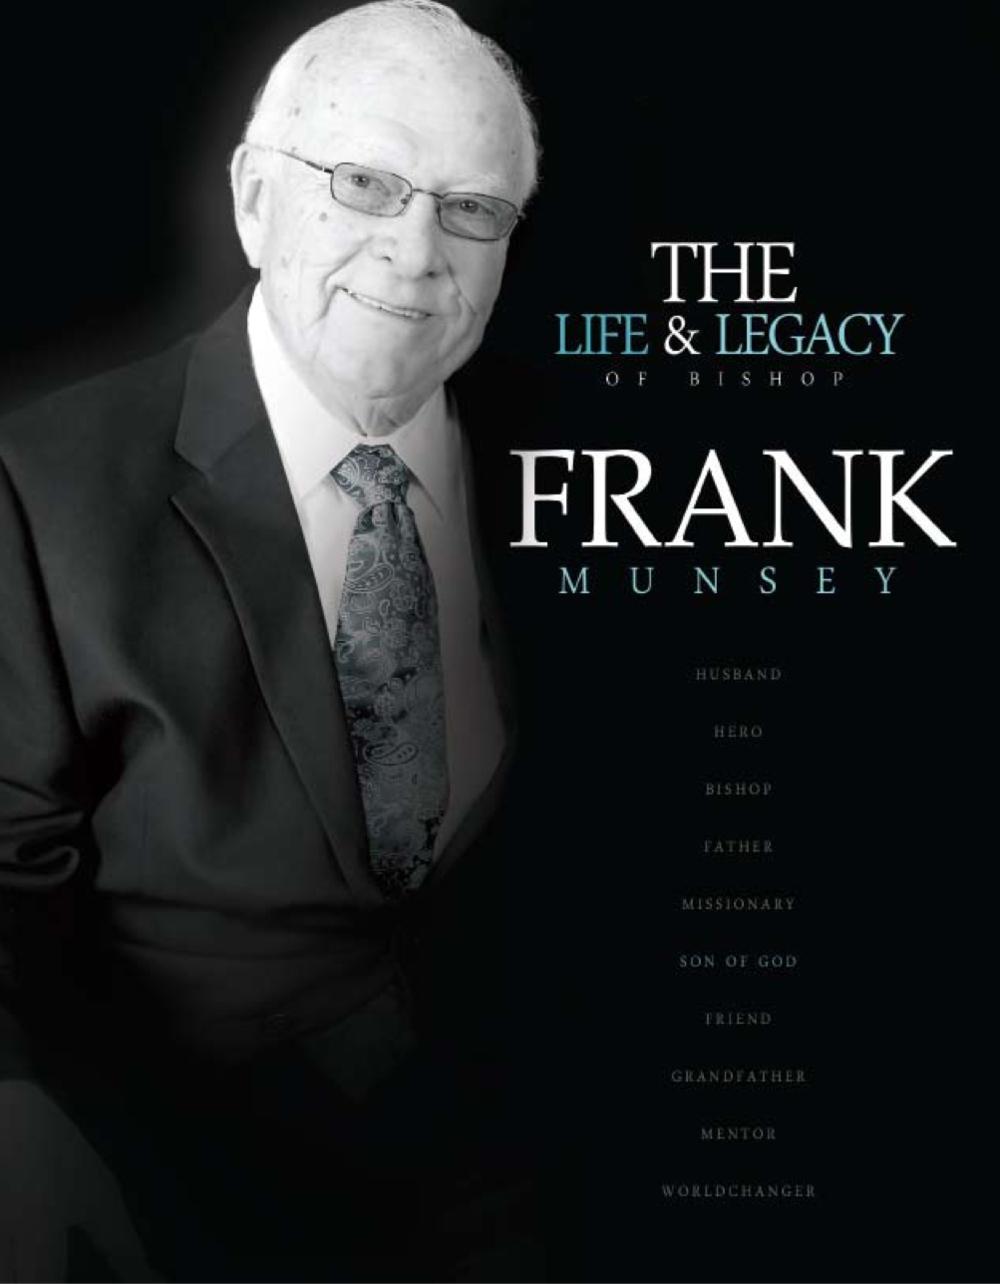 LIFE CELEBRATION & MEMORIAL BOOK